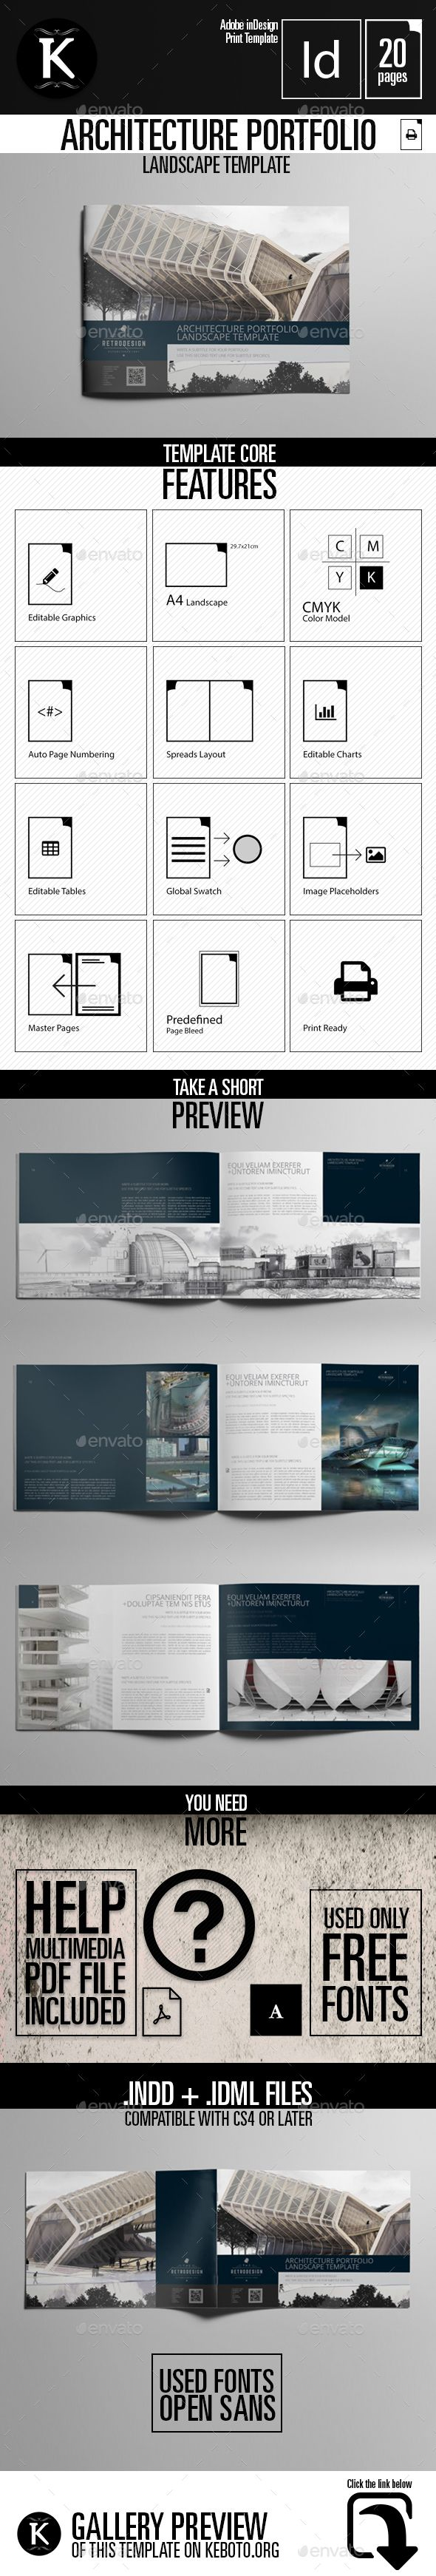 Architecture Portfolio Landscape Template - Portfolio Brochures